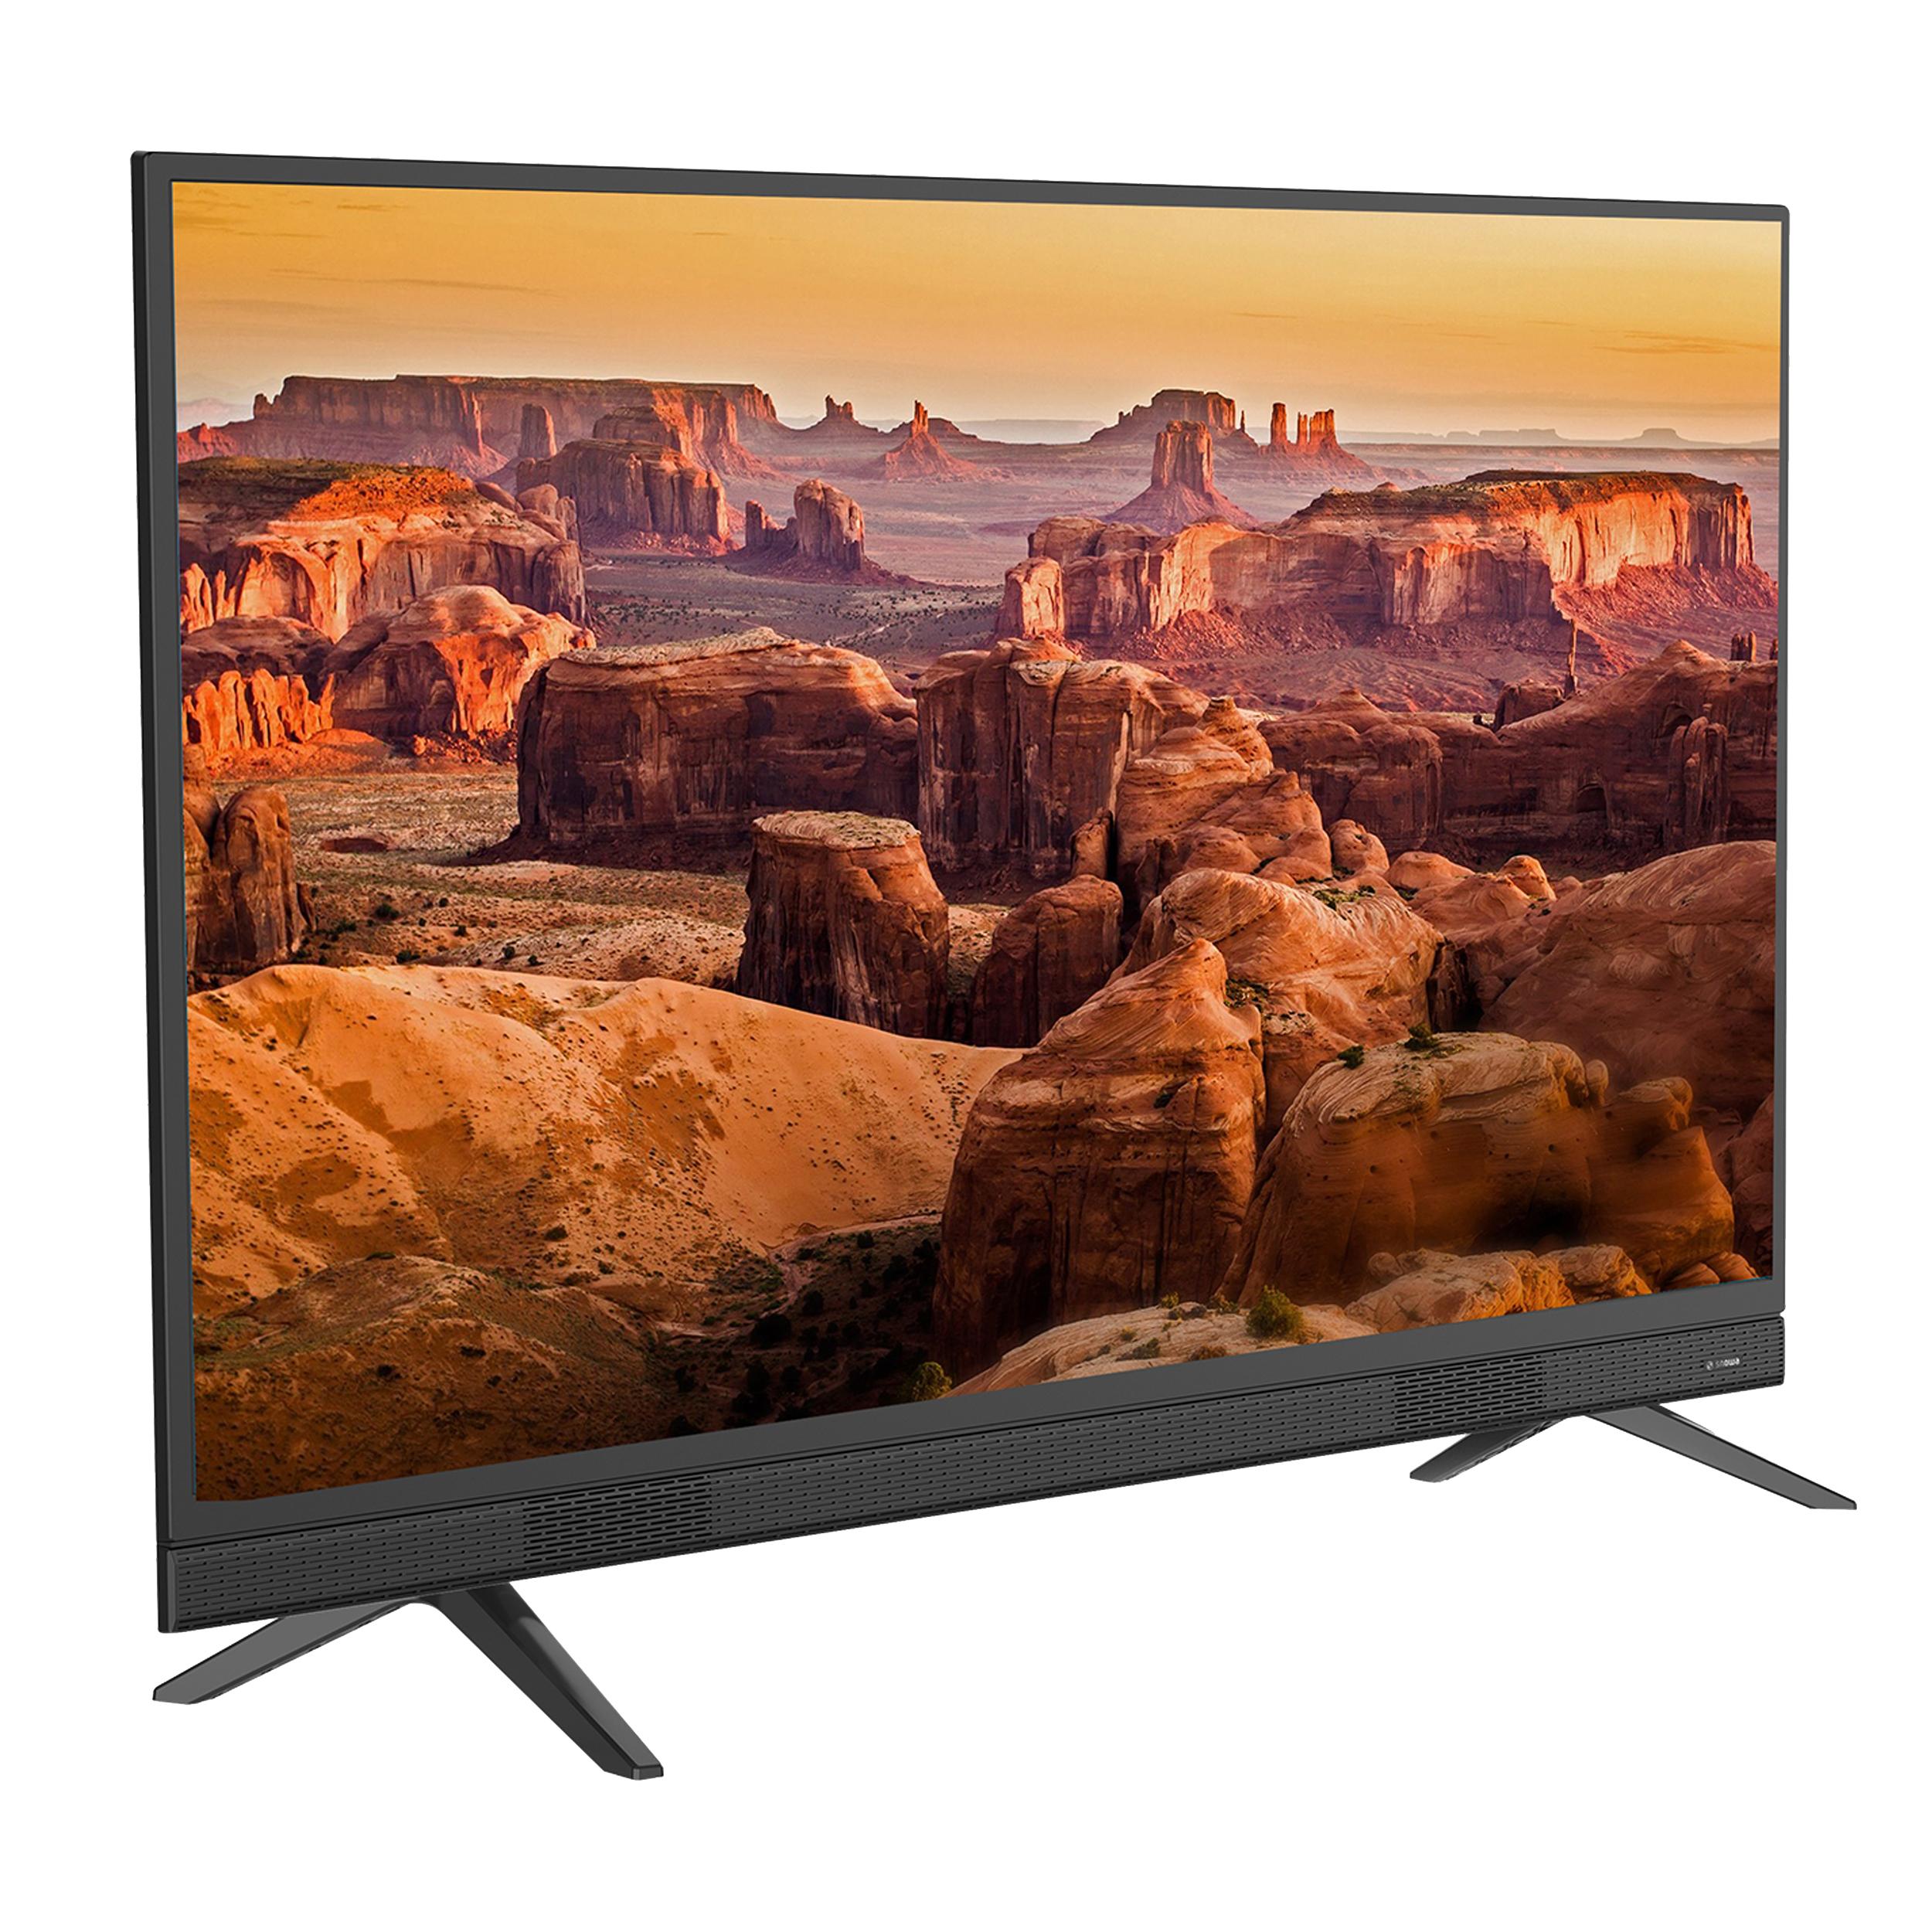 تلویزیون ال ای دی اسنوا مدل  SLD-43SA240 سایز 43 اینچ